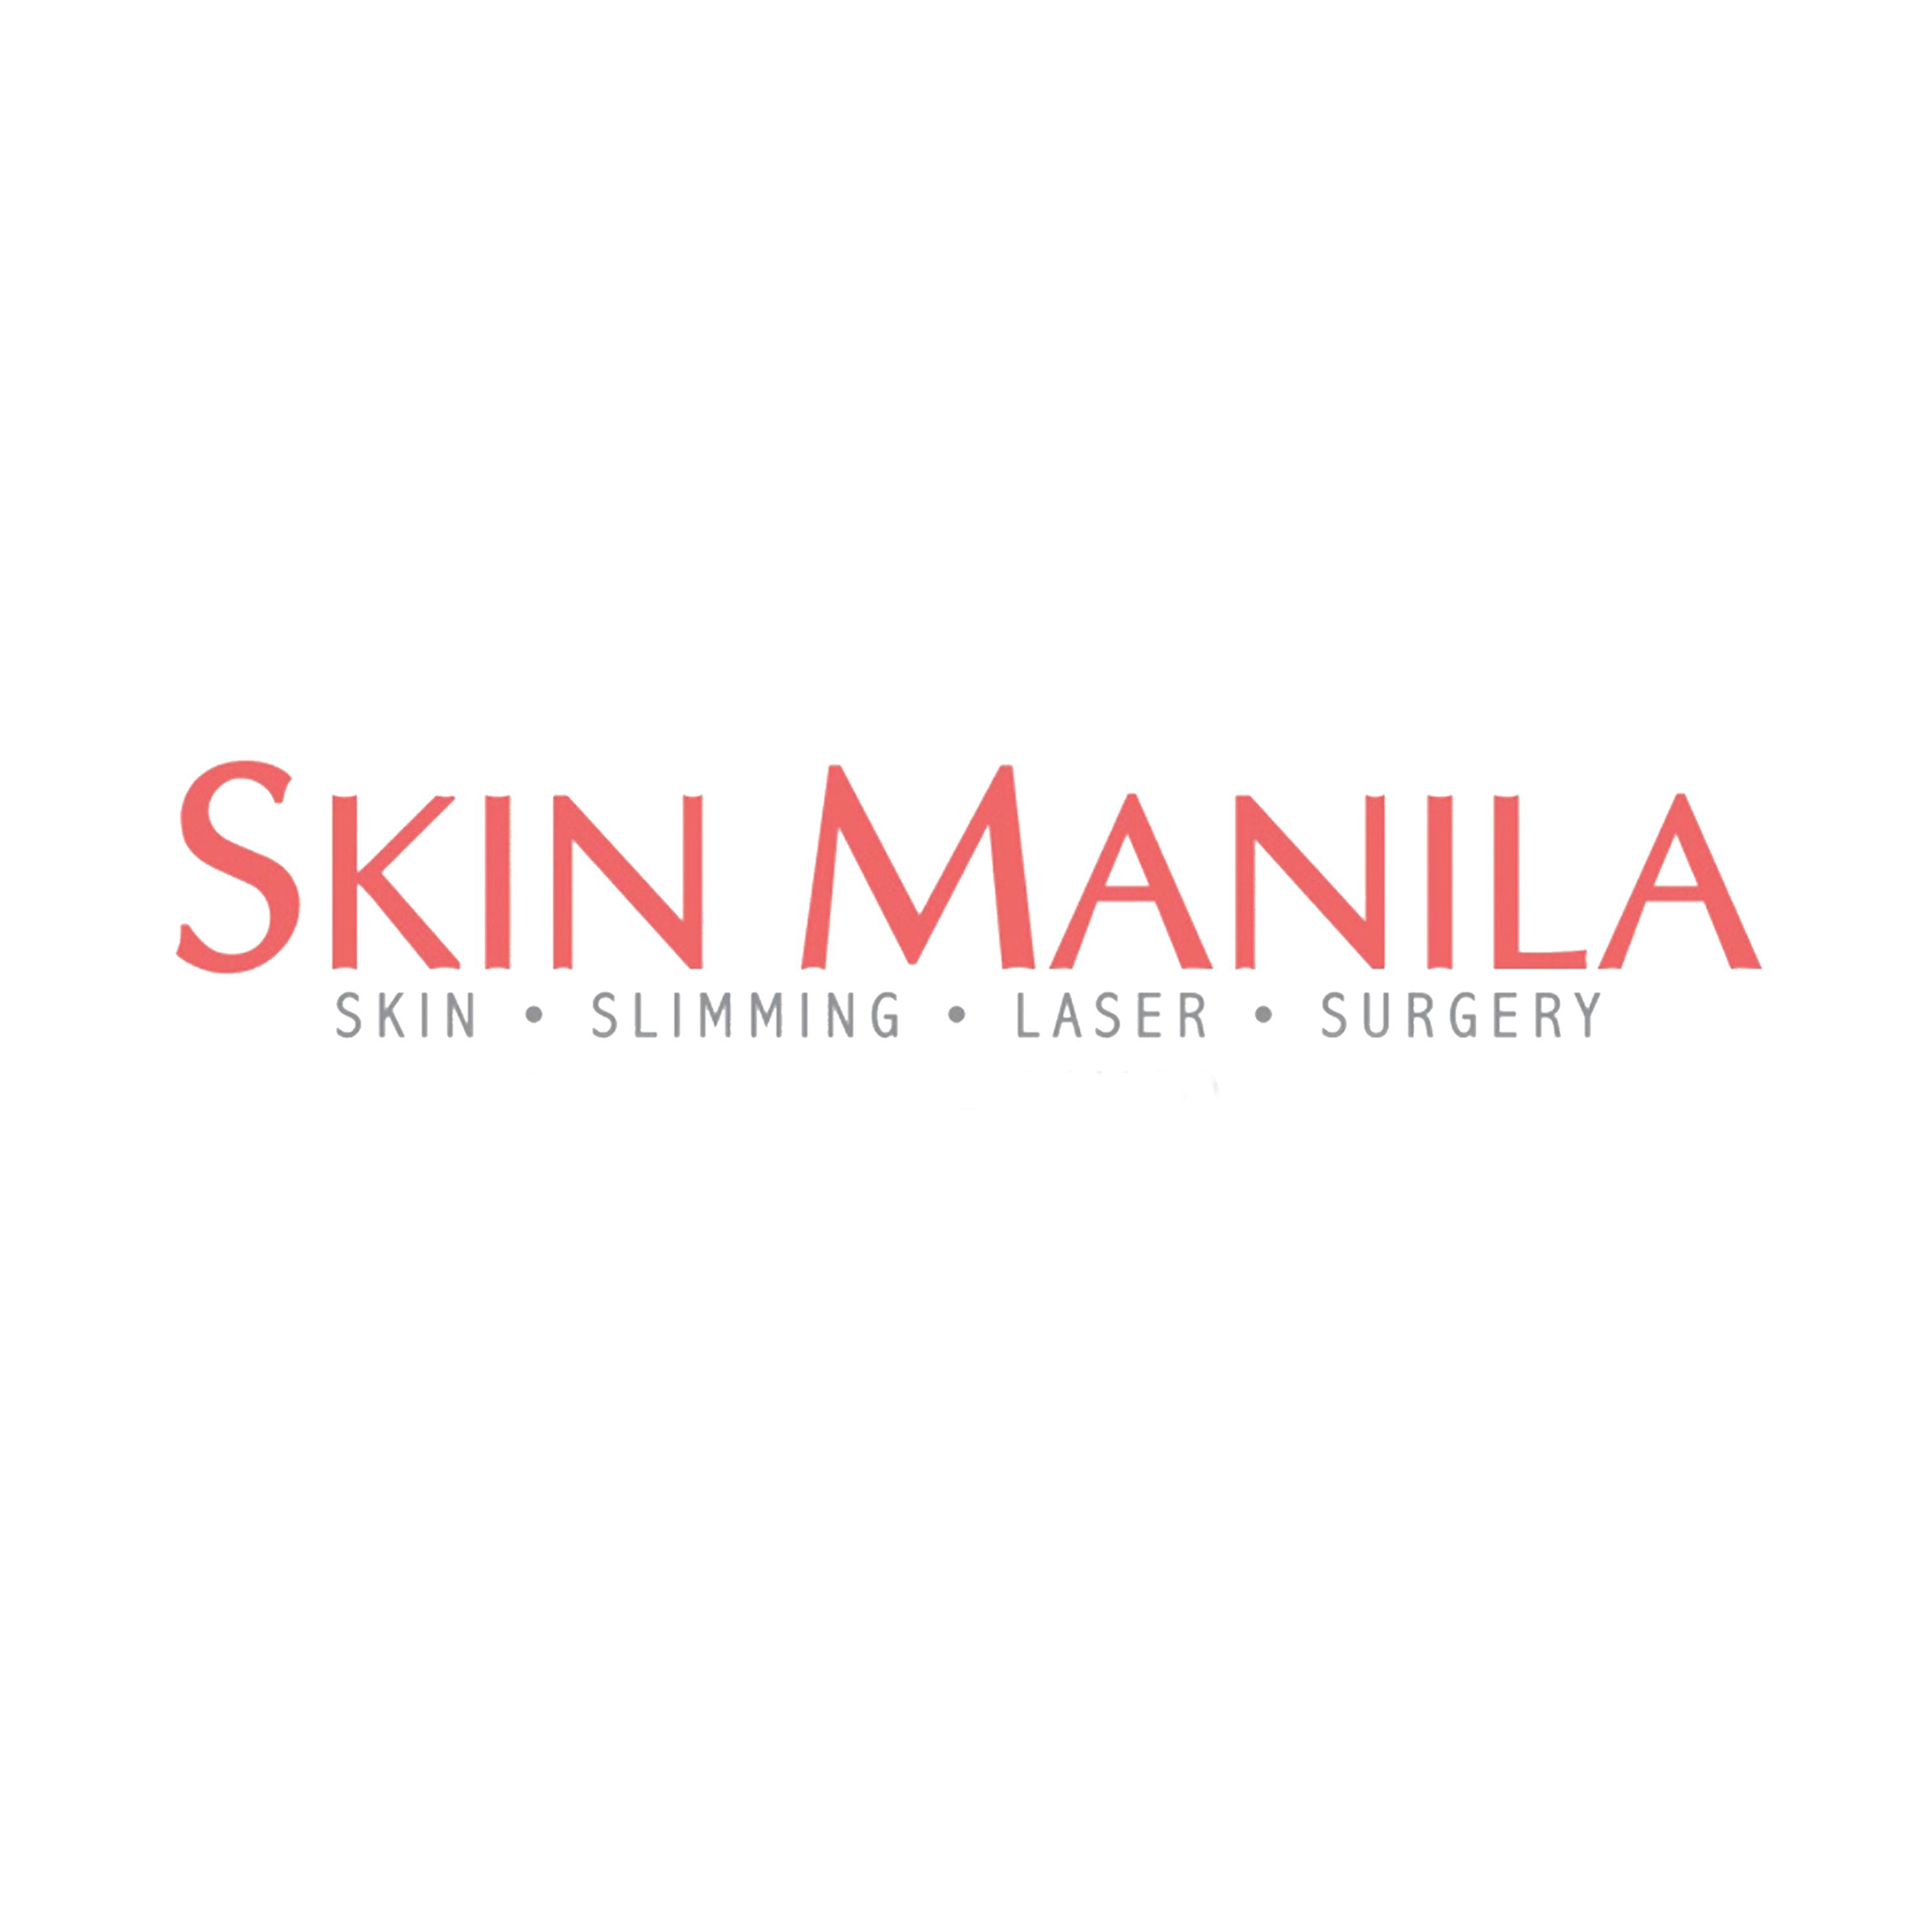 Skin Manila brand logo